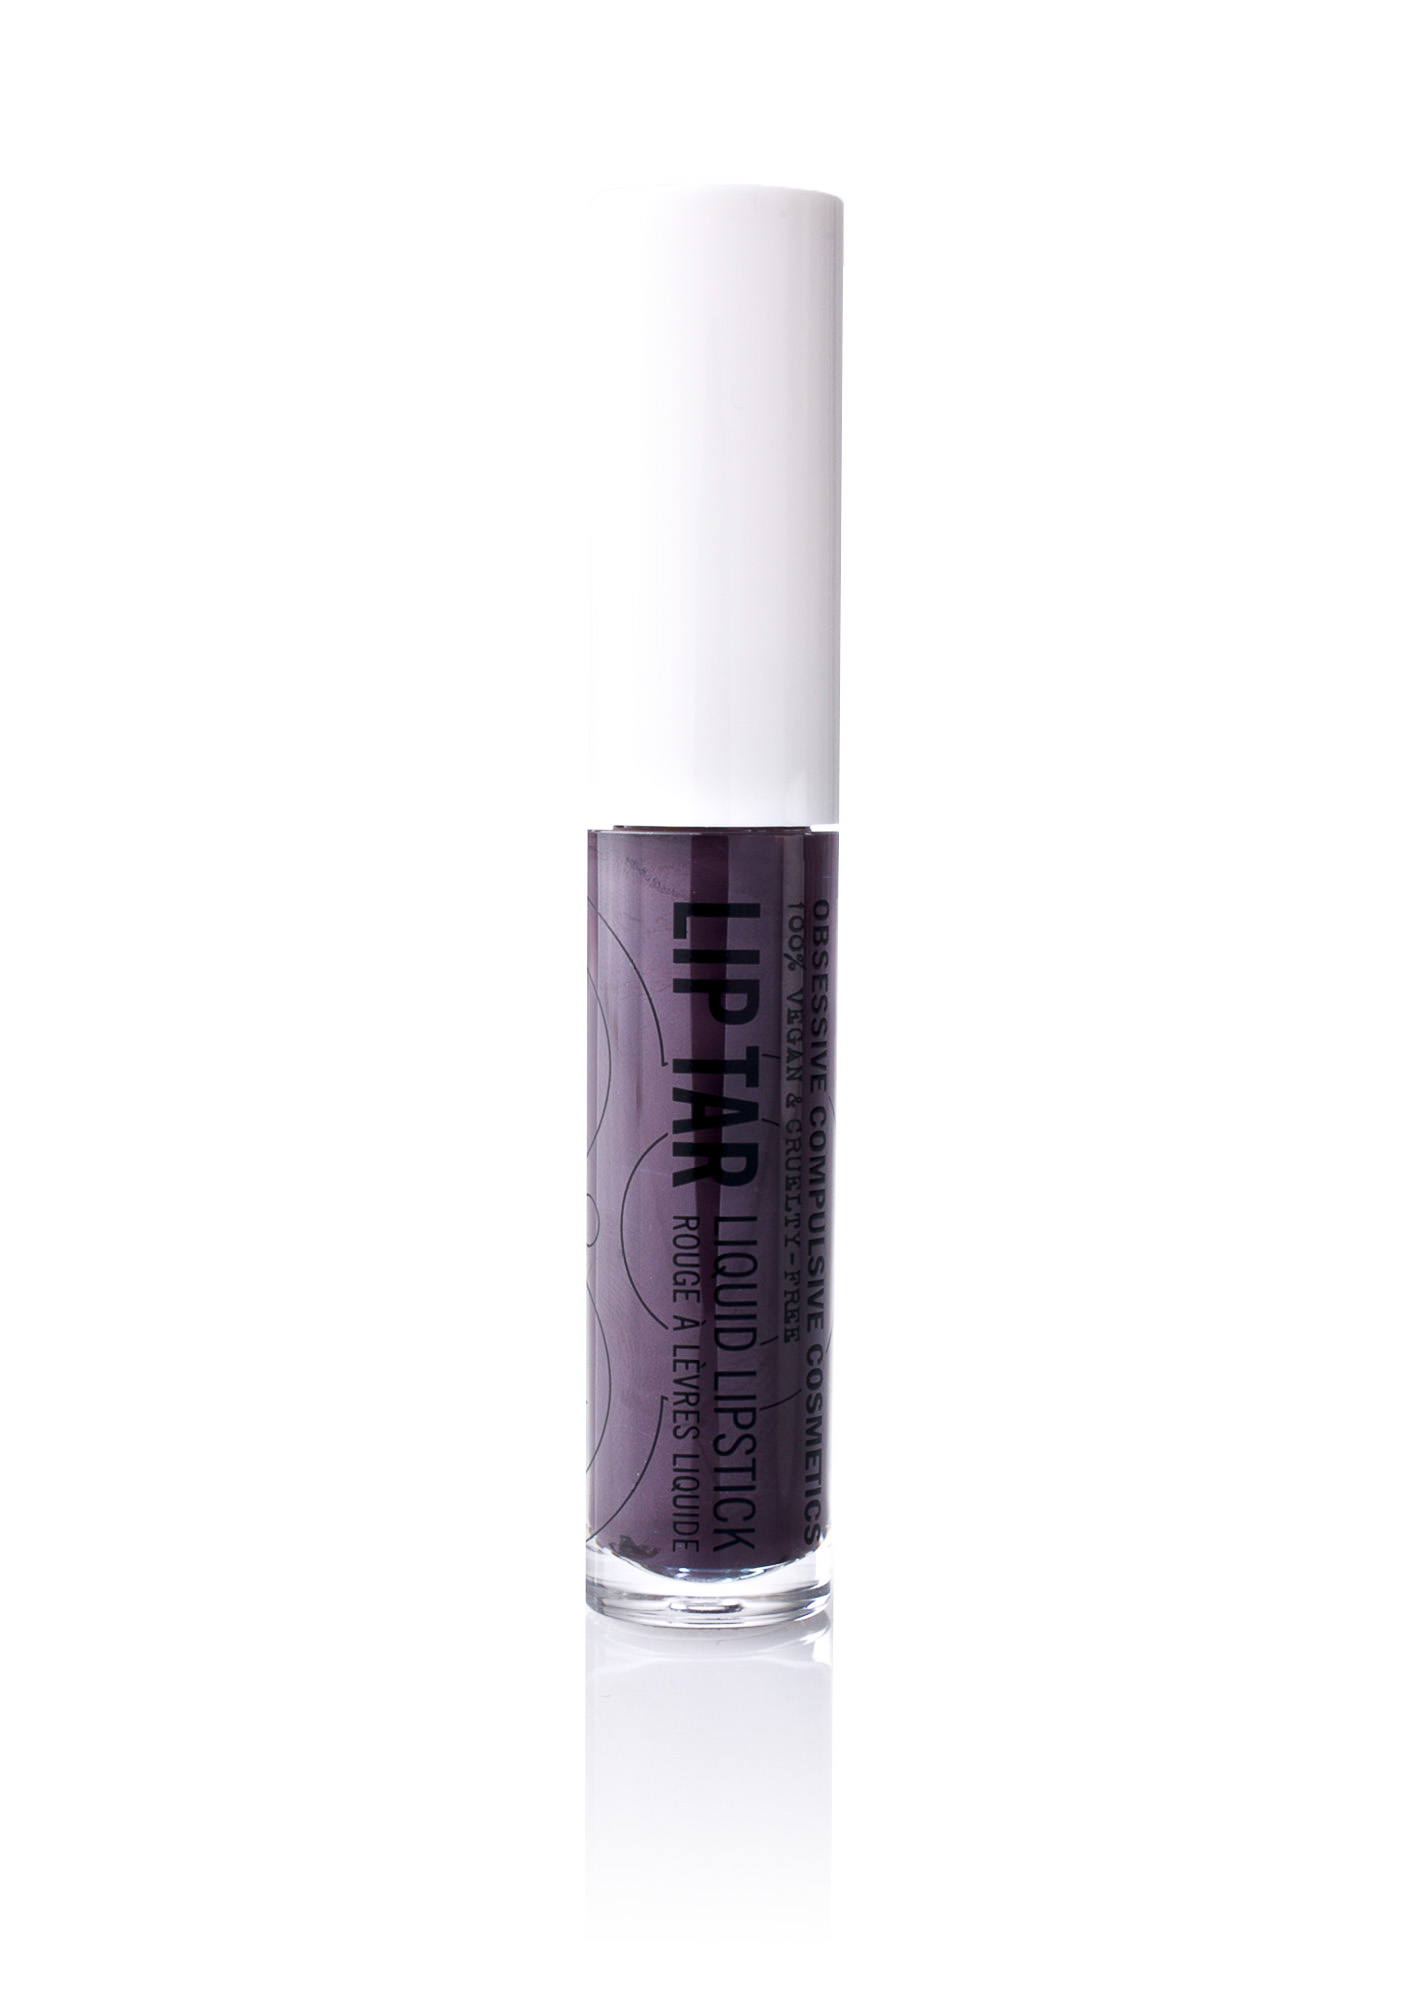 Obsessive Compulsive Cosmetics Stud Lip Tar